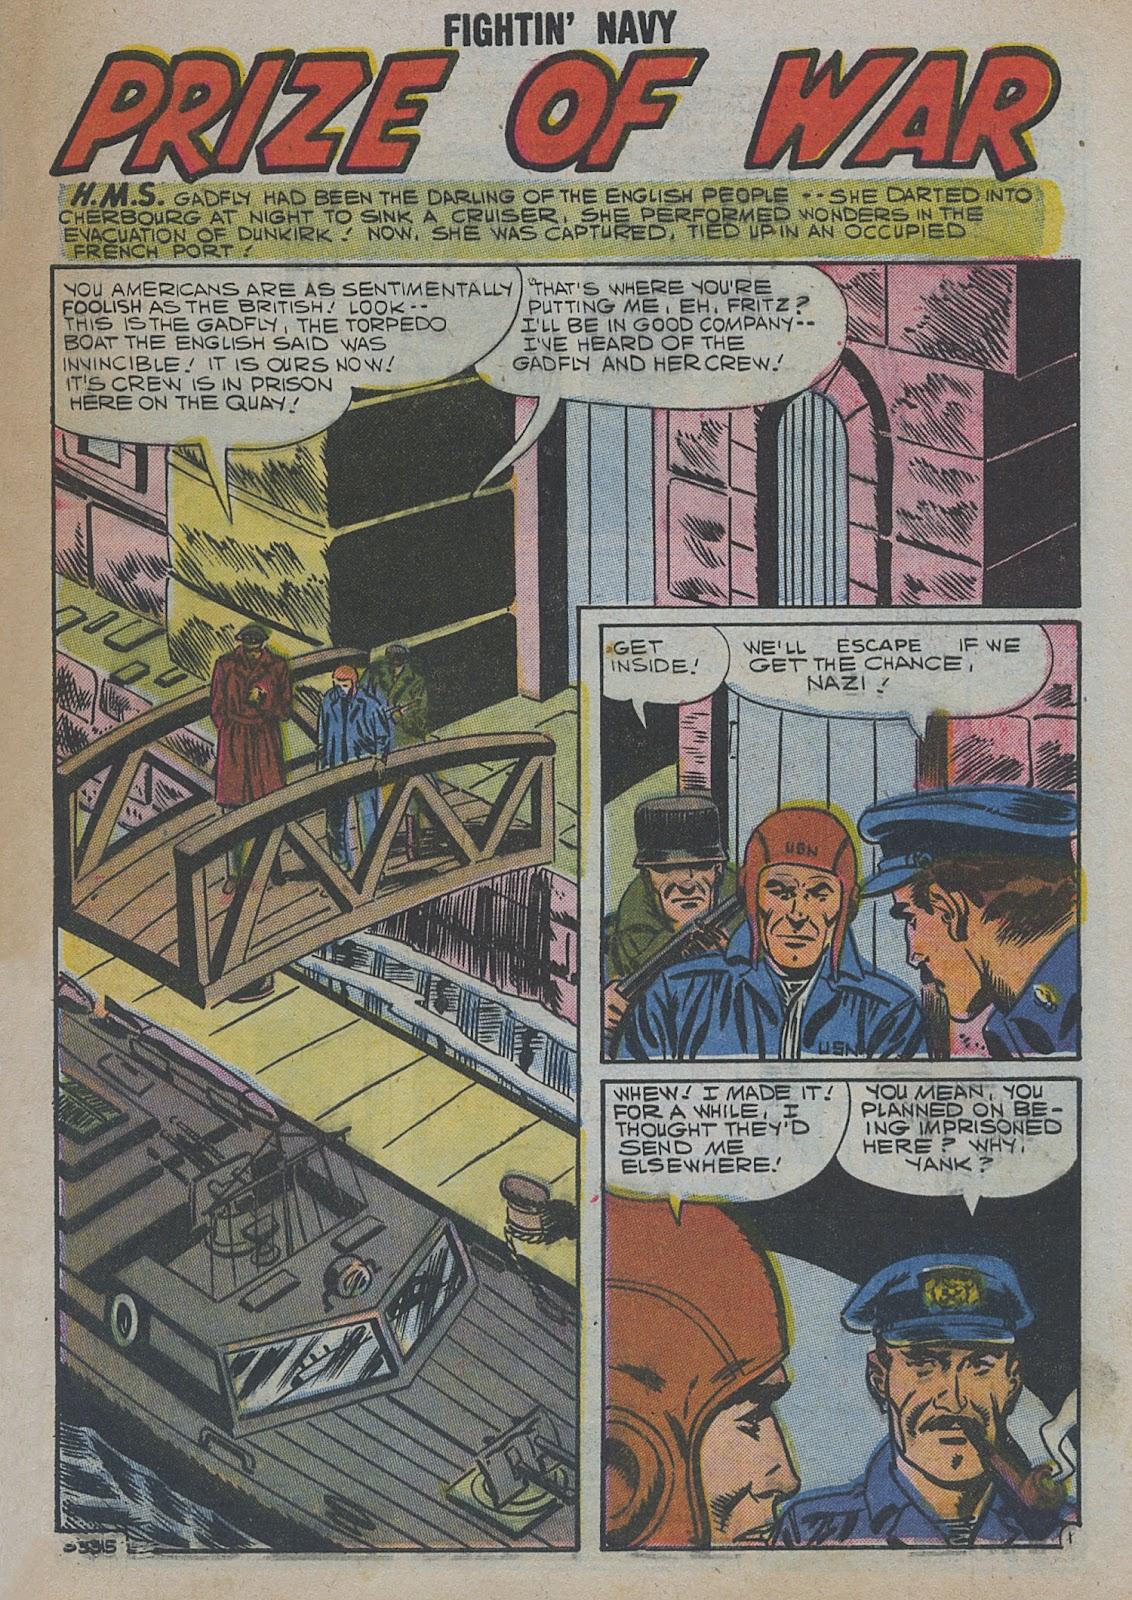 Read online Fightin' Navy comic -  Issue #82 - 17